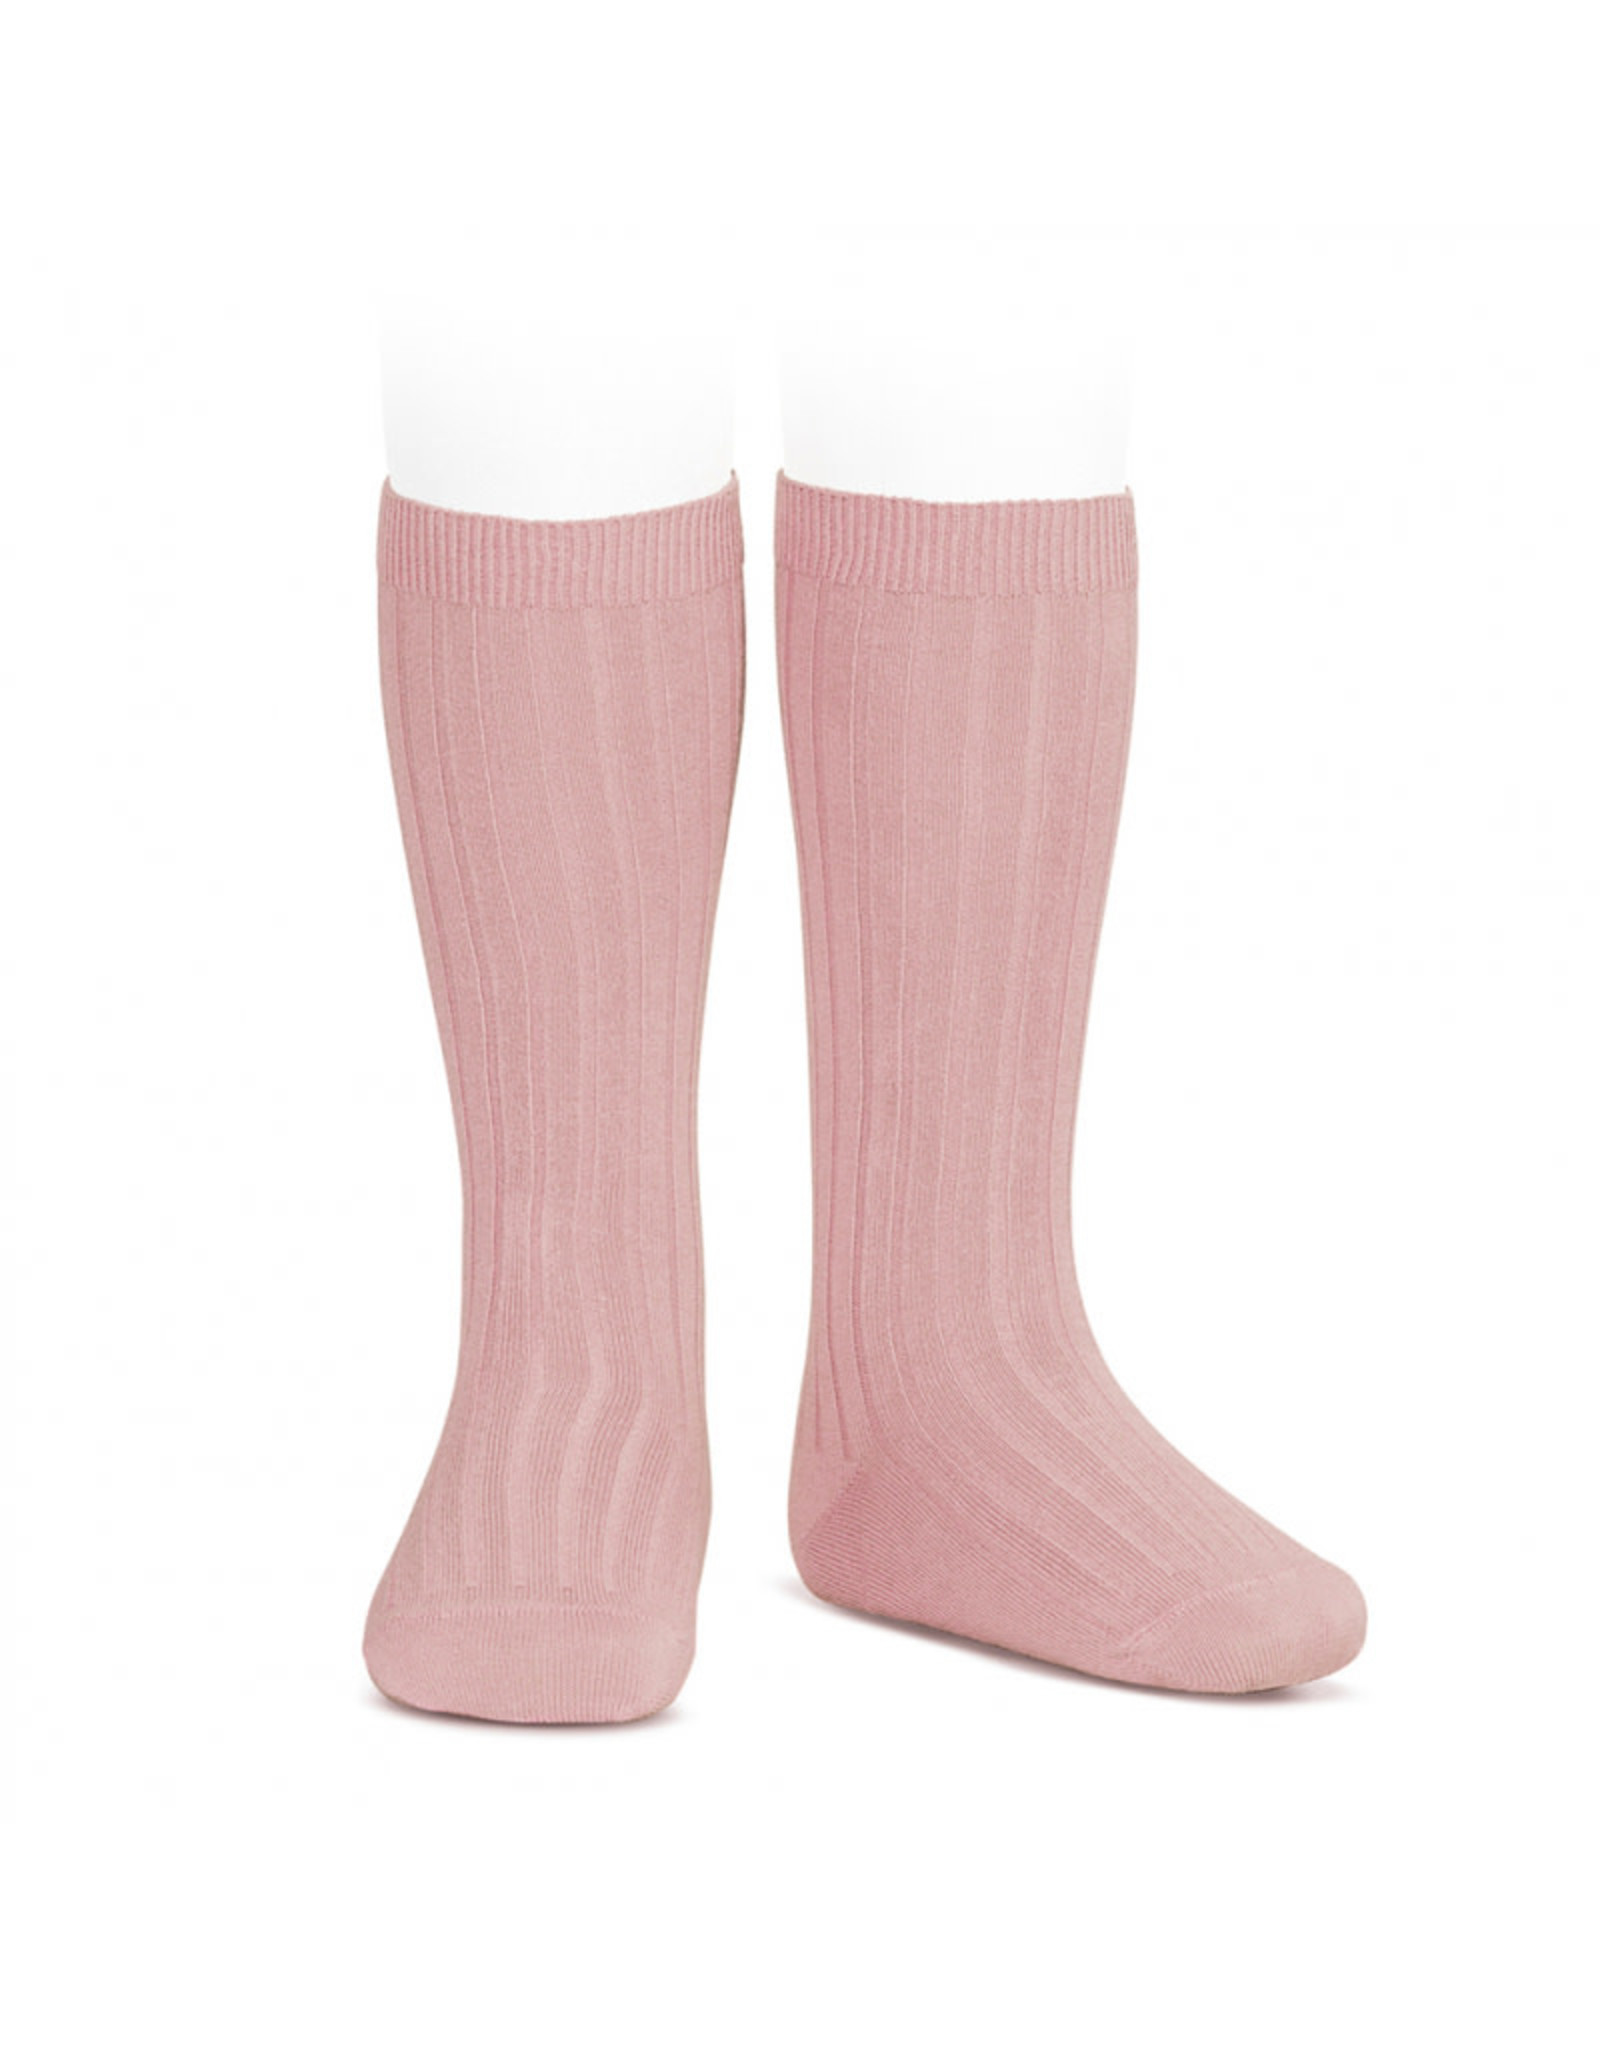 CONDOR Pale Pink Ribbed Knee Socks